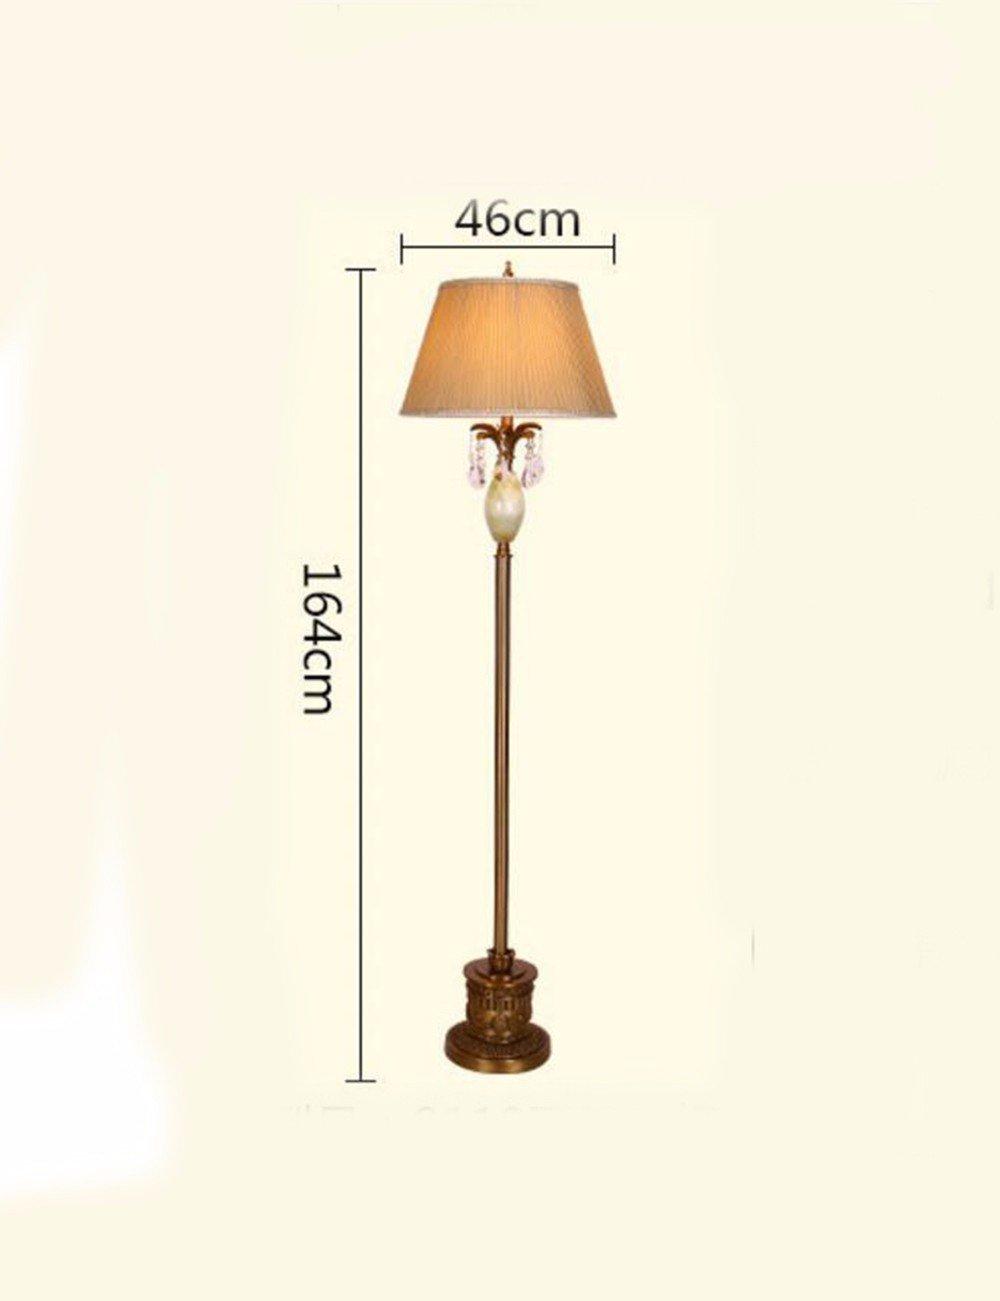 CJSHVR-European style table lamp, European style all copper desk lamp, floor lamp, modern simple bedroom, living room, study hall, creative study desk lamp,B